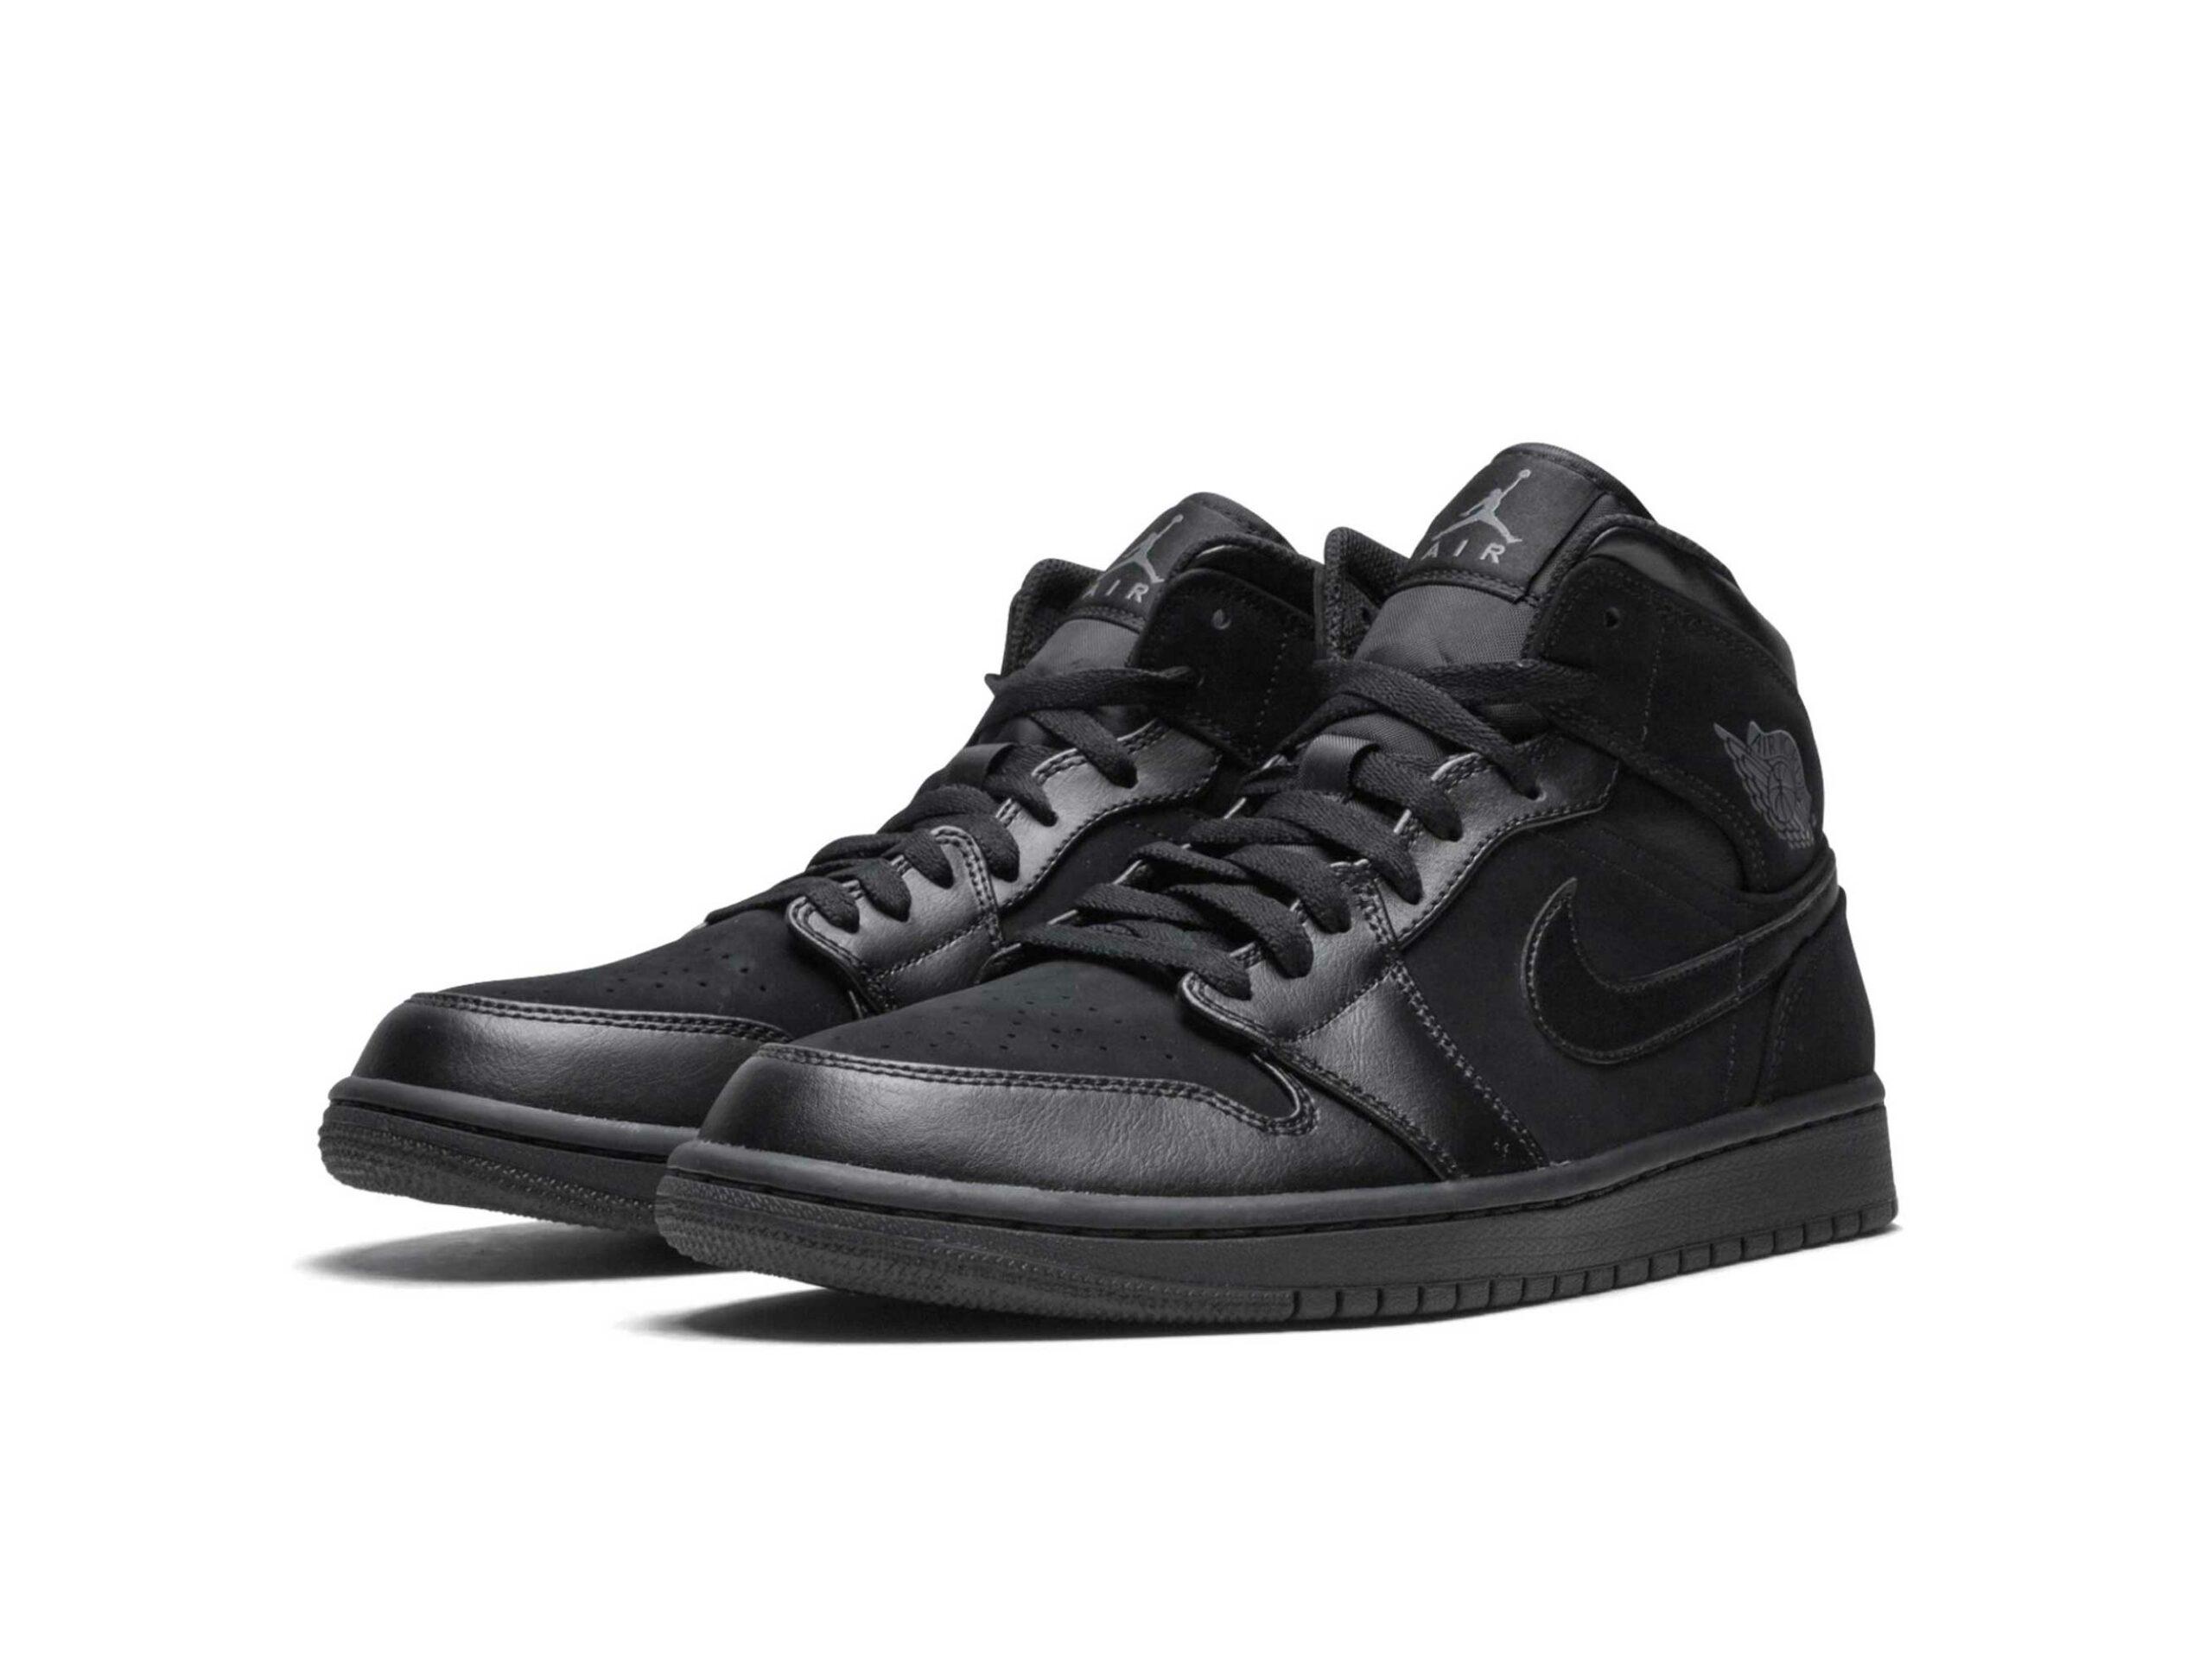 nike air Jordan 1 mid black 554724_050 купить